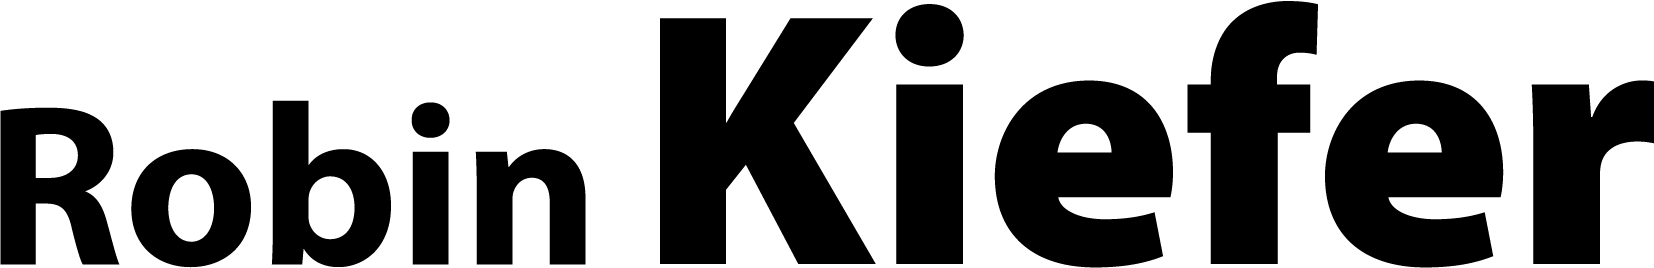 Robin_Kiefer_Logo-neu-2